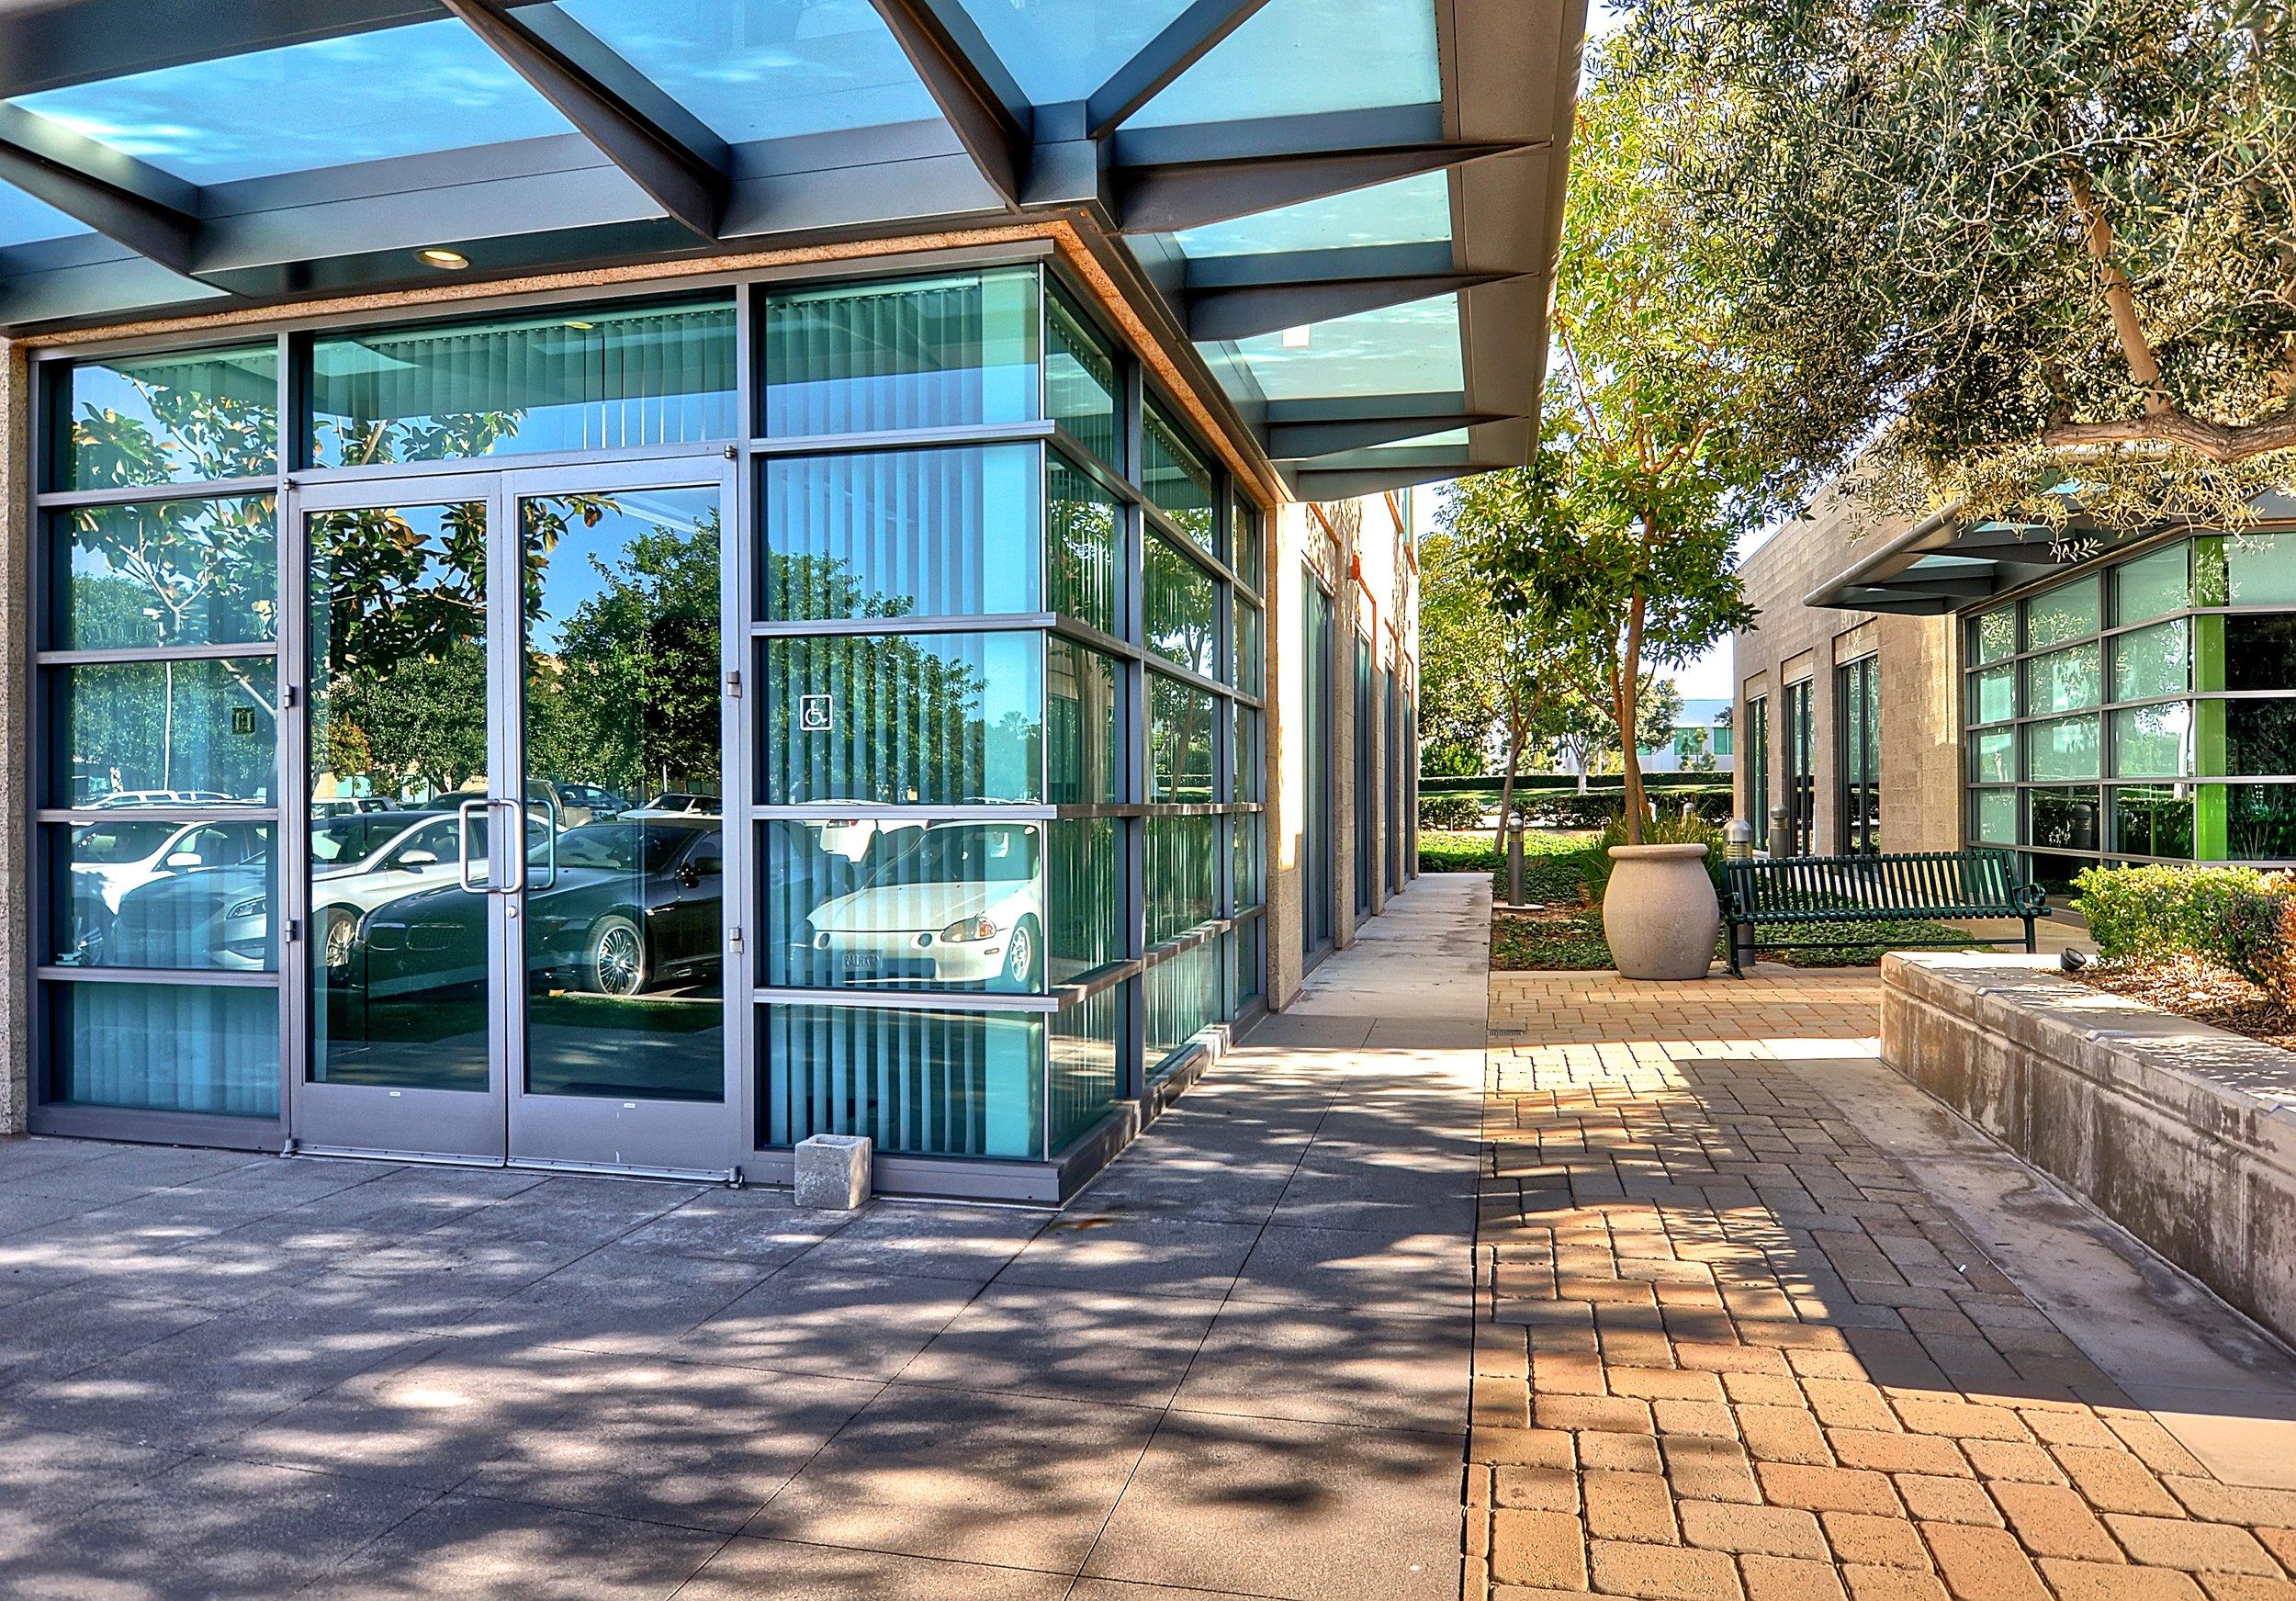 Irvine Center Building